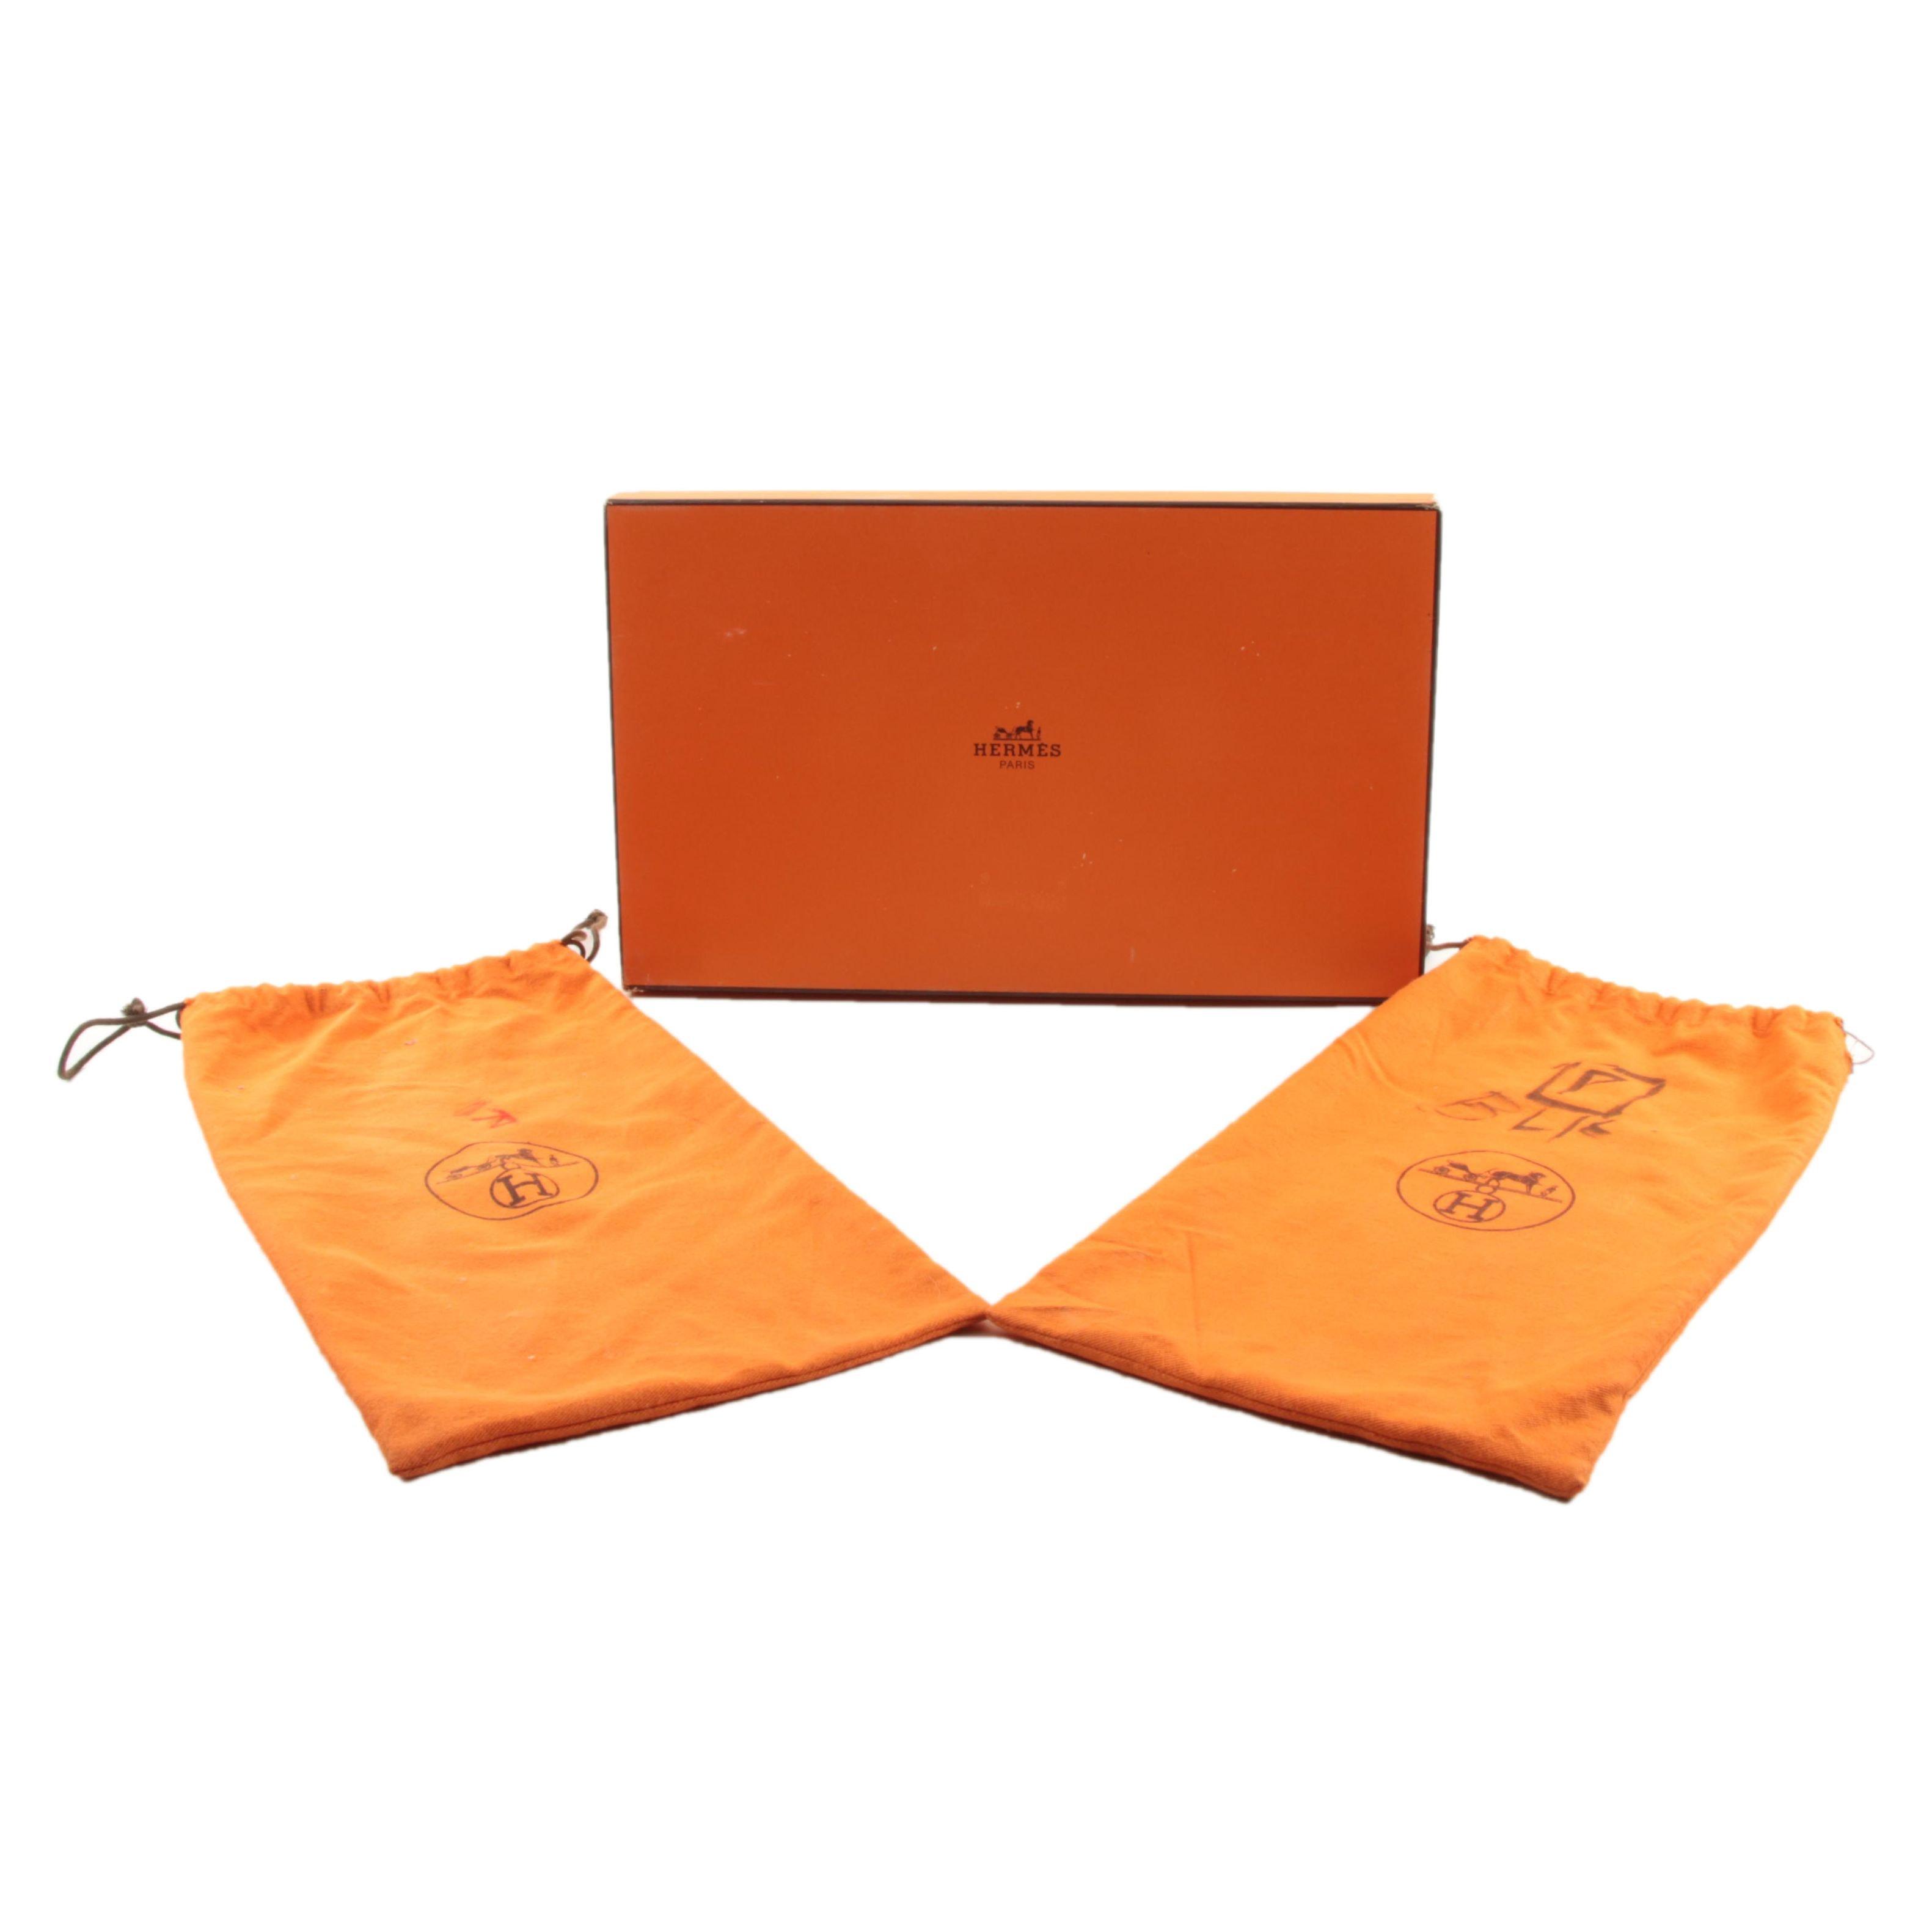 Hermès Box and Dust Bags